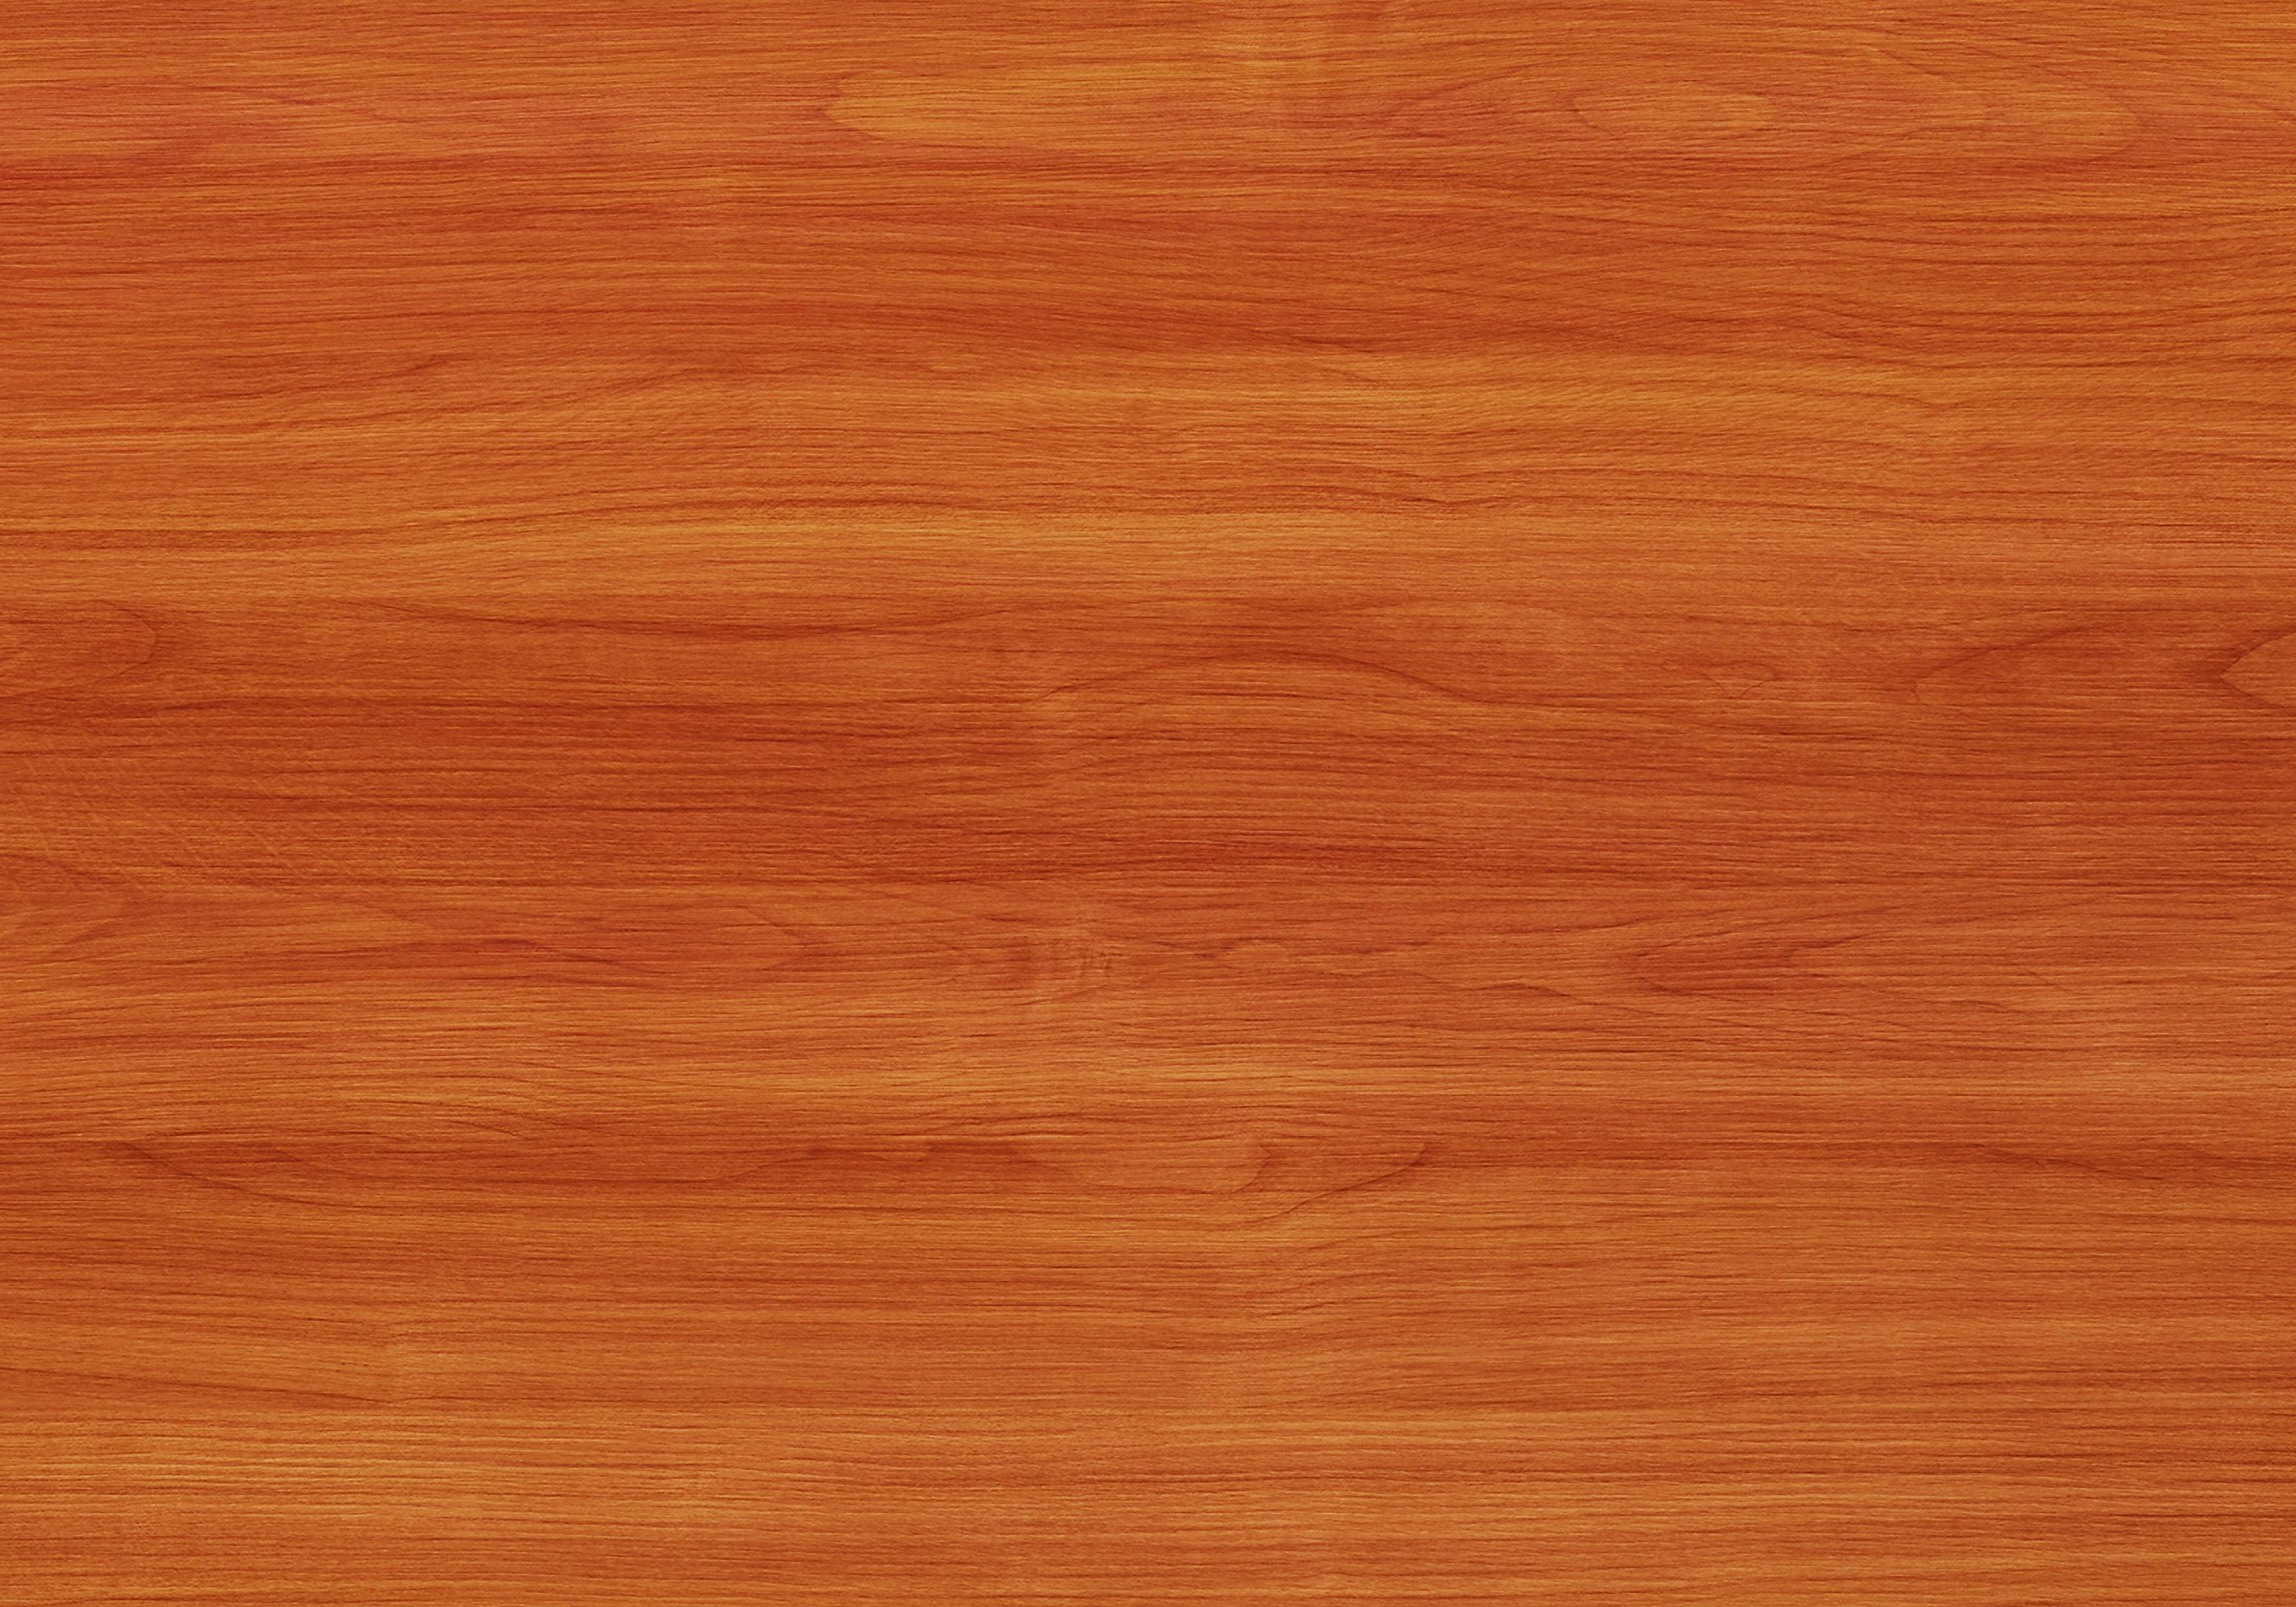 Rodgers Flooring image 4